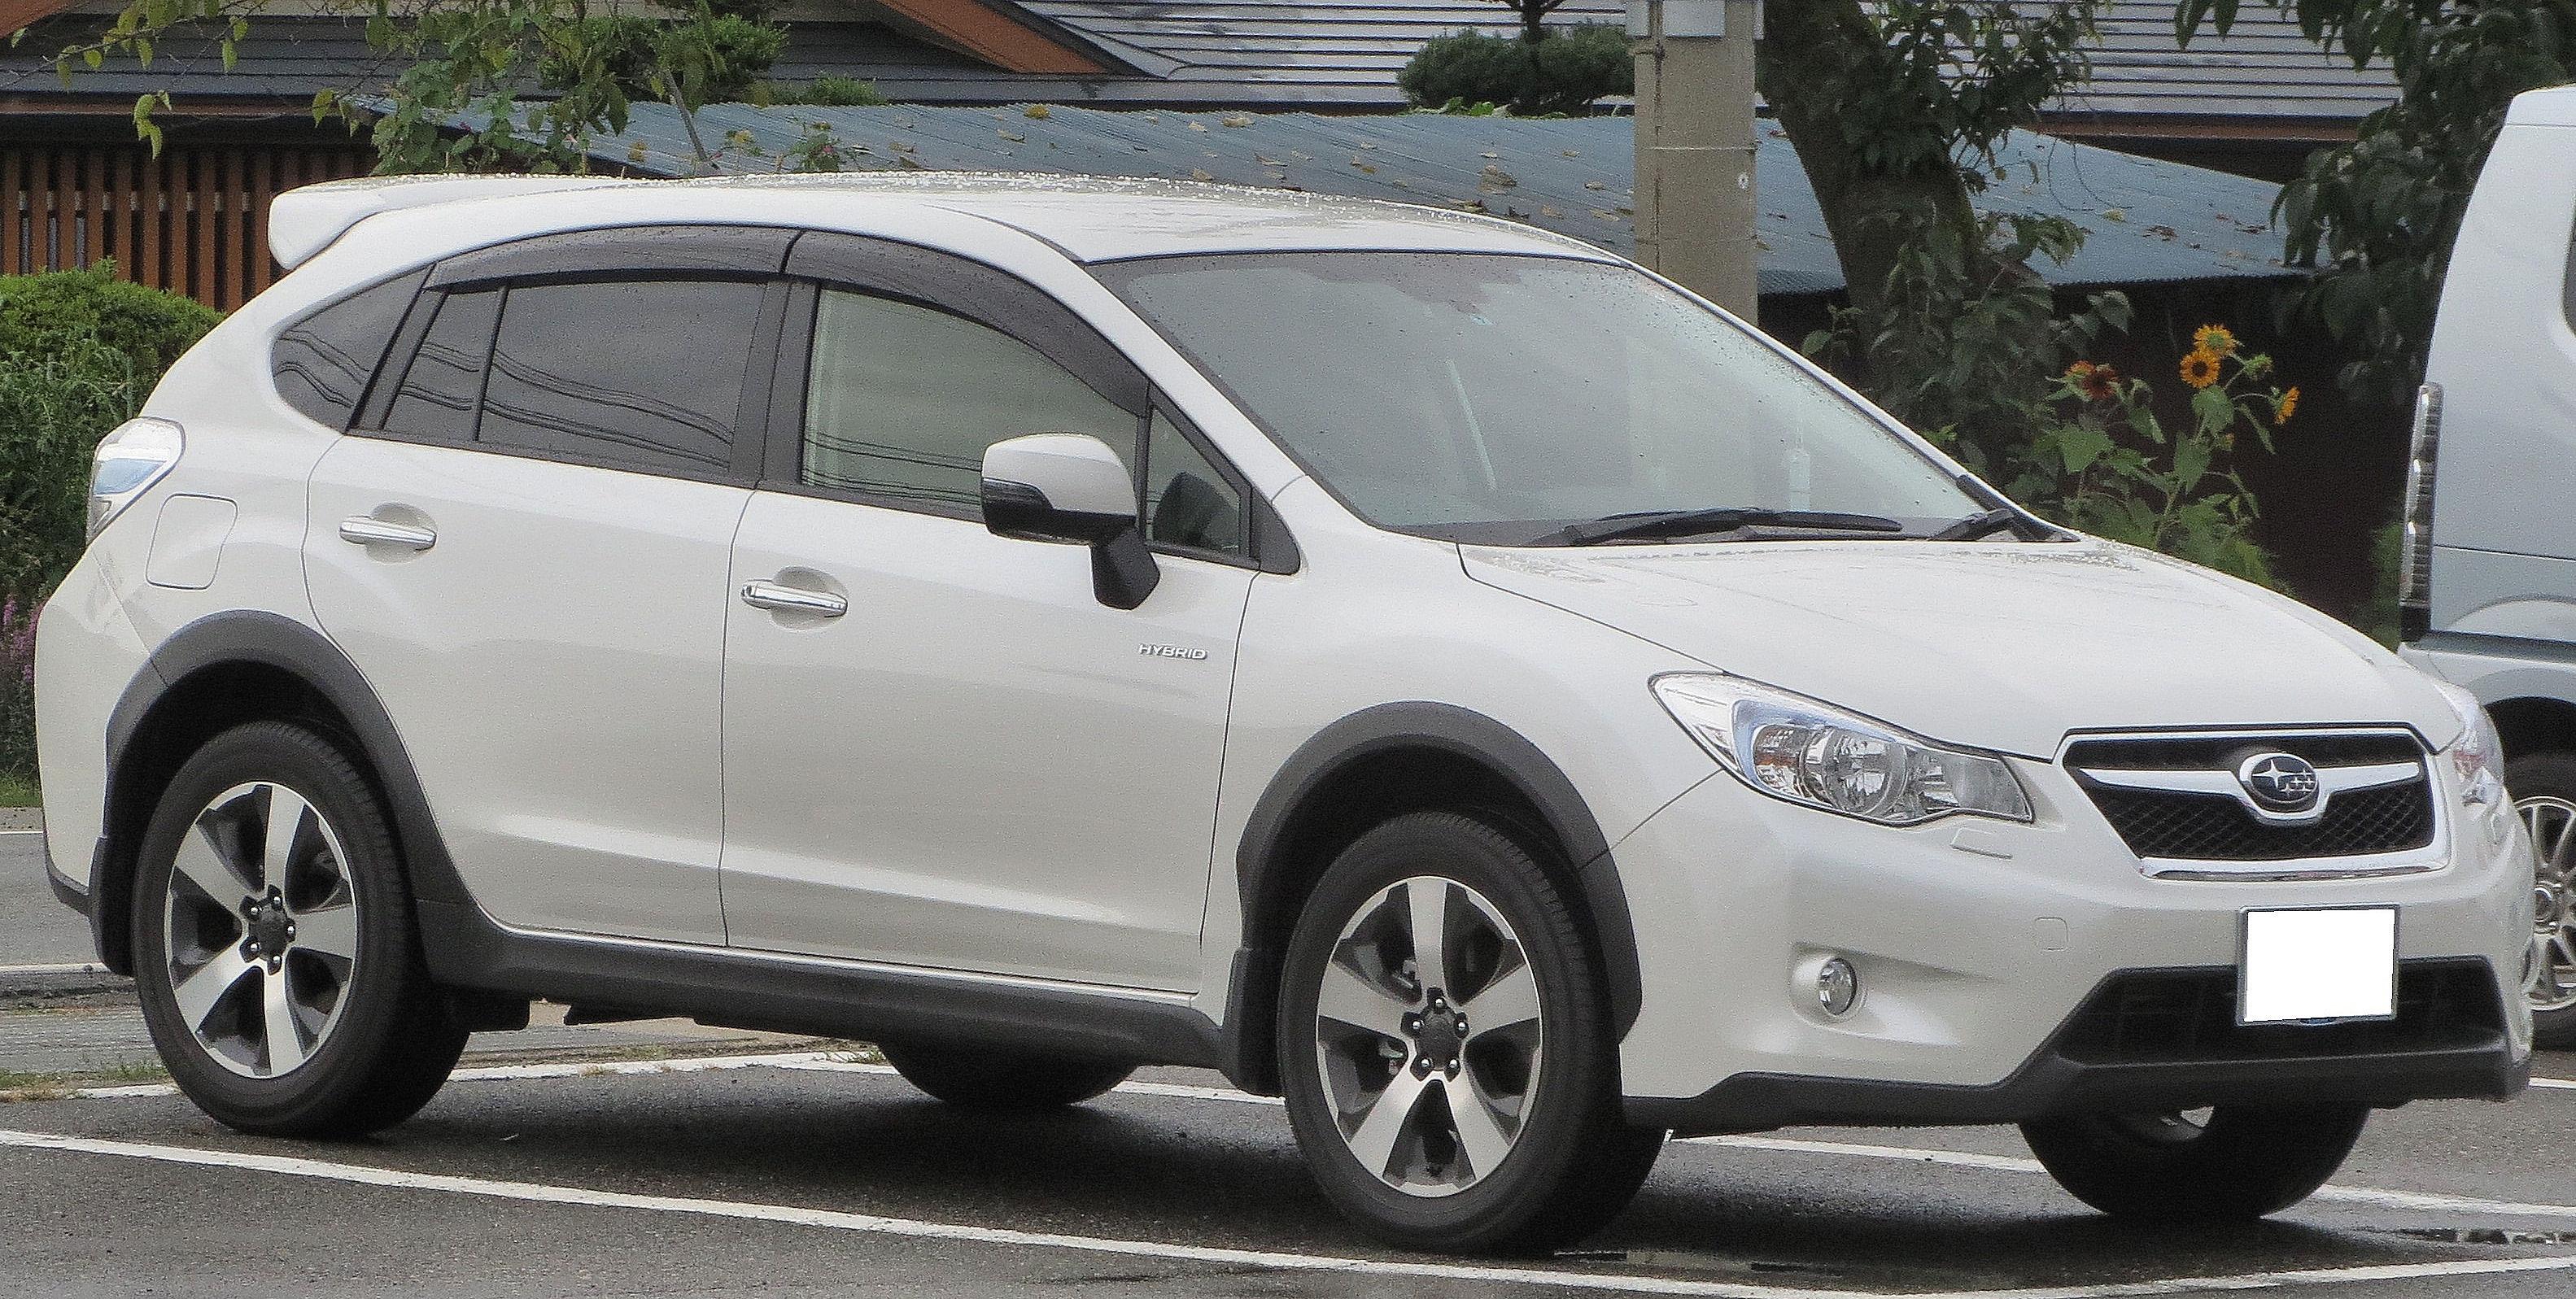 Subaru Impreza Sport Hybrid >> File:Subaru XV HYBRID 2.0i-L EyeSight w.JPG